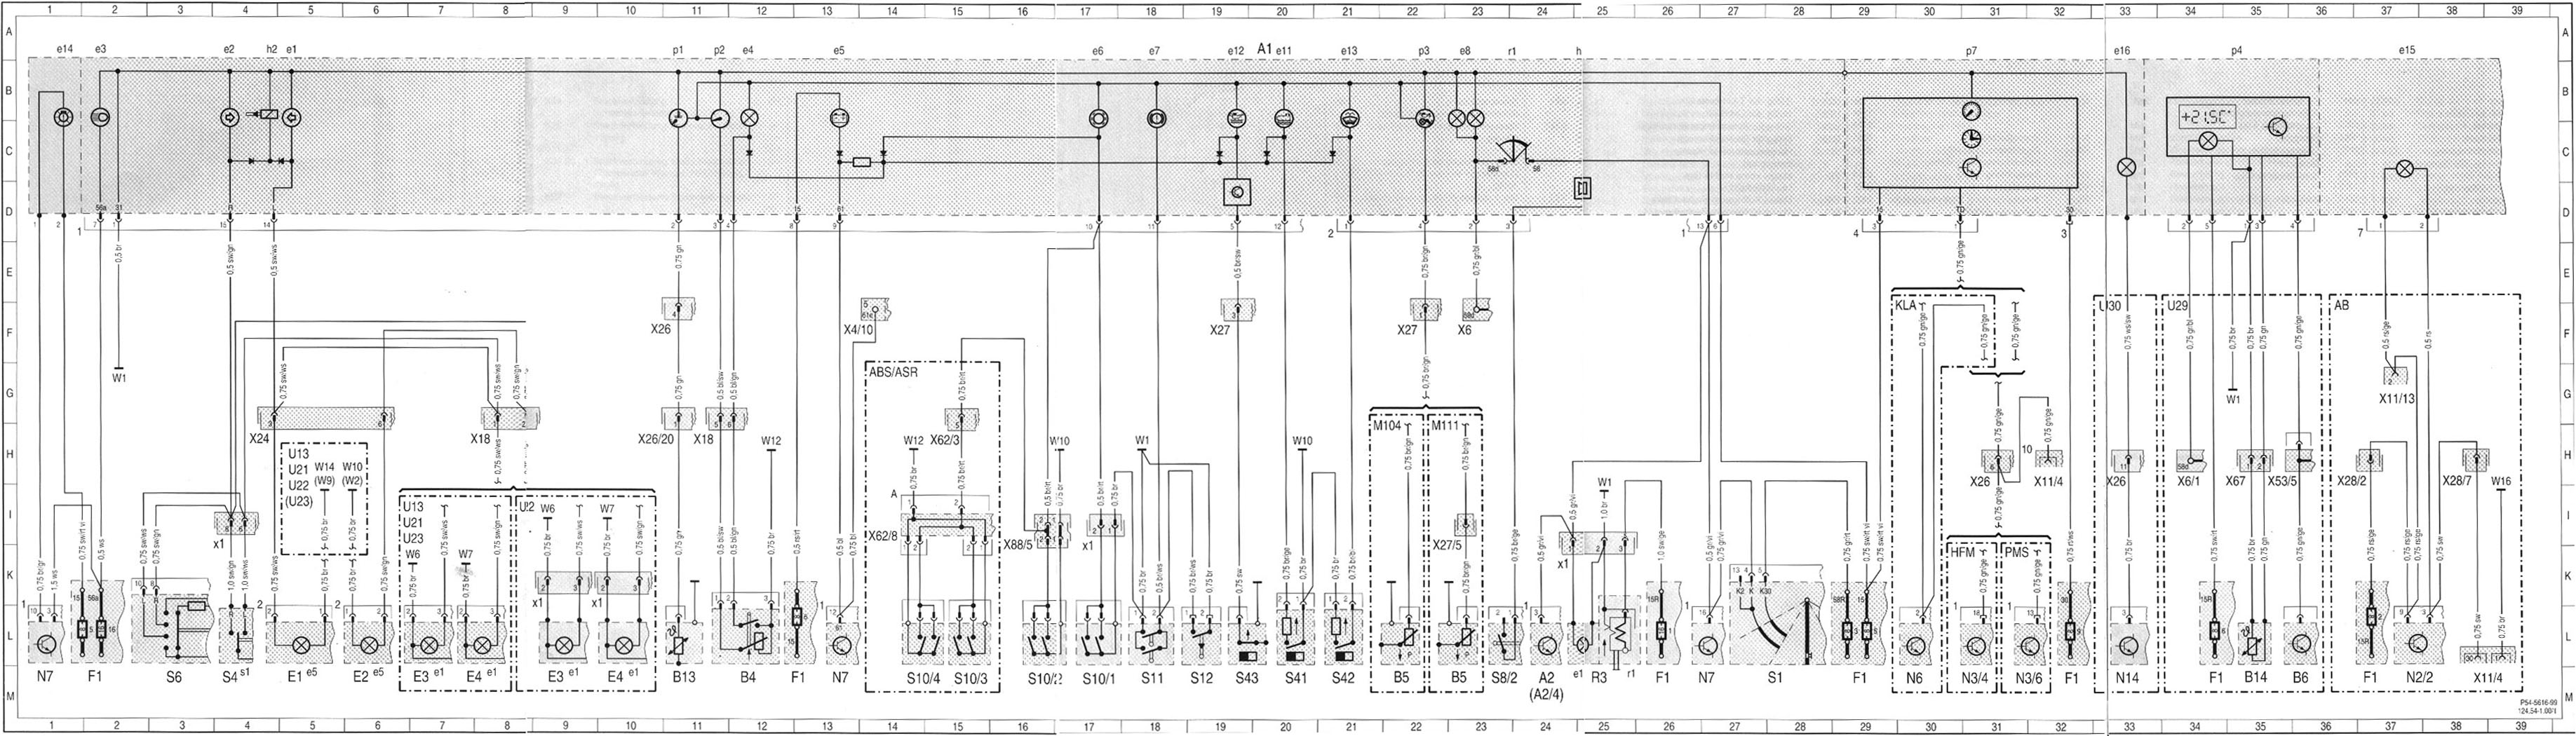 Инструкция По Эксплуатации Mercedes 123